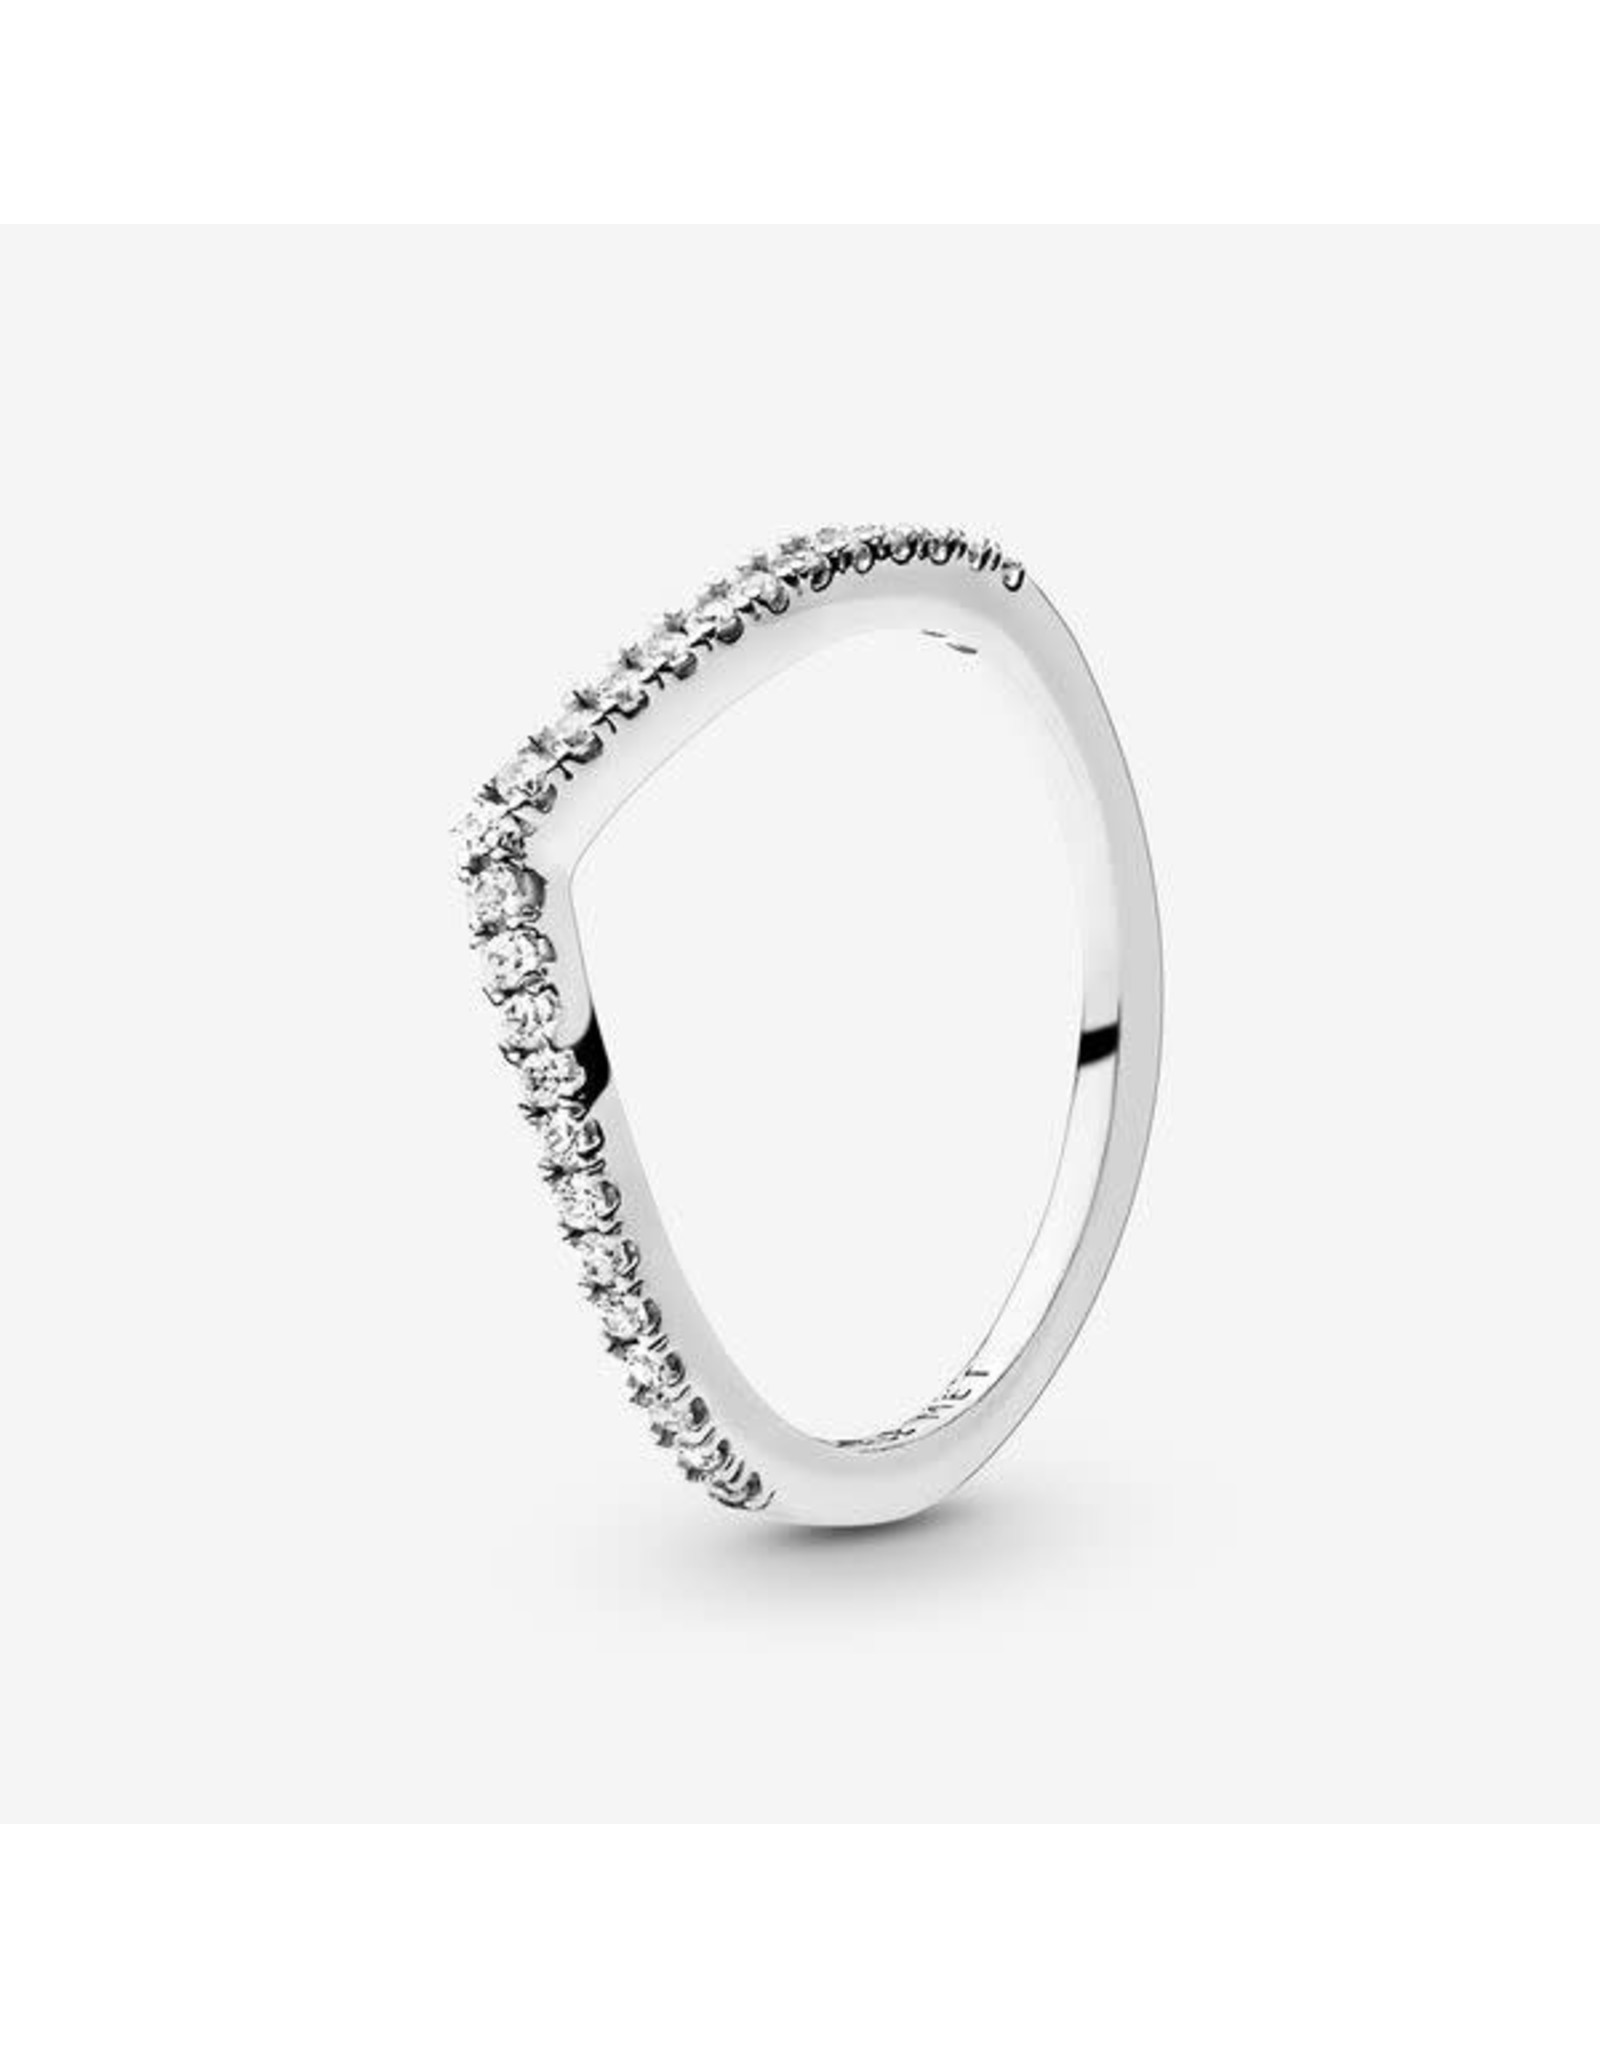 Pandora Pandora Ring,(196316CZ)  Shimmering Wish, Clear CZ